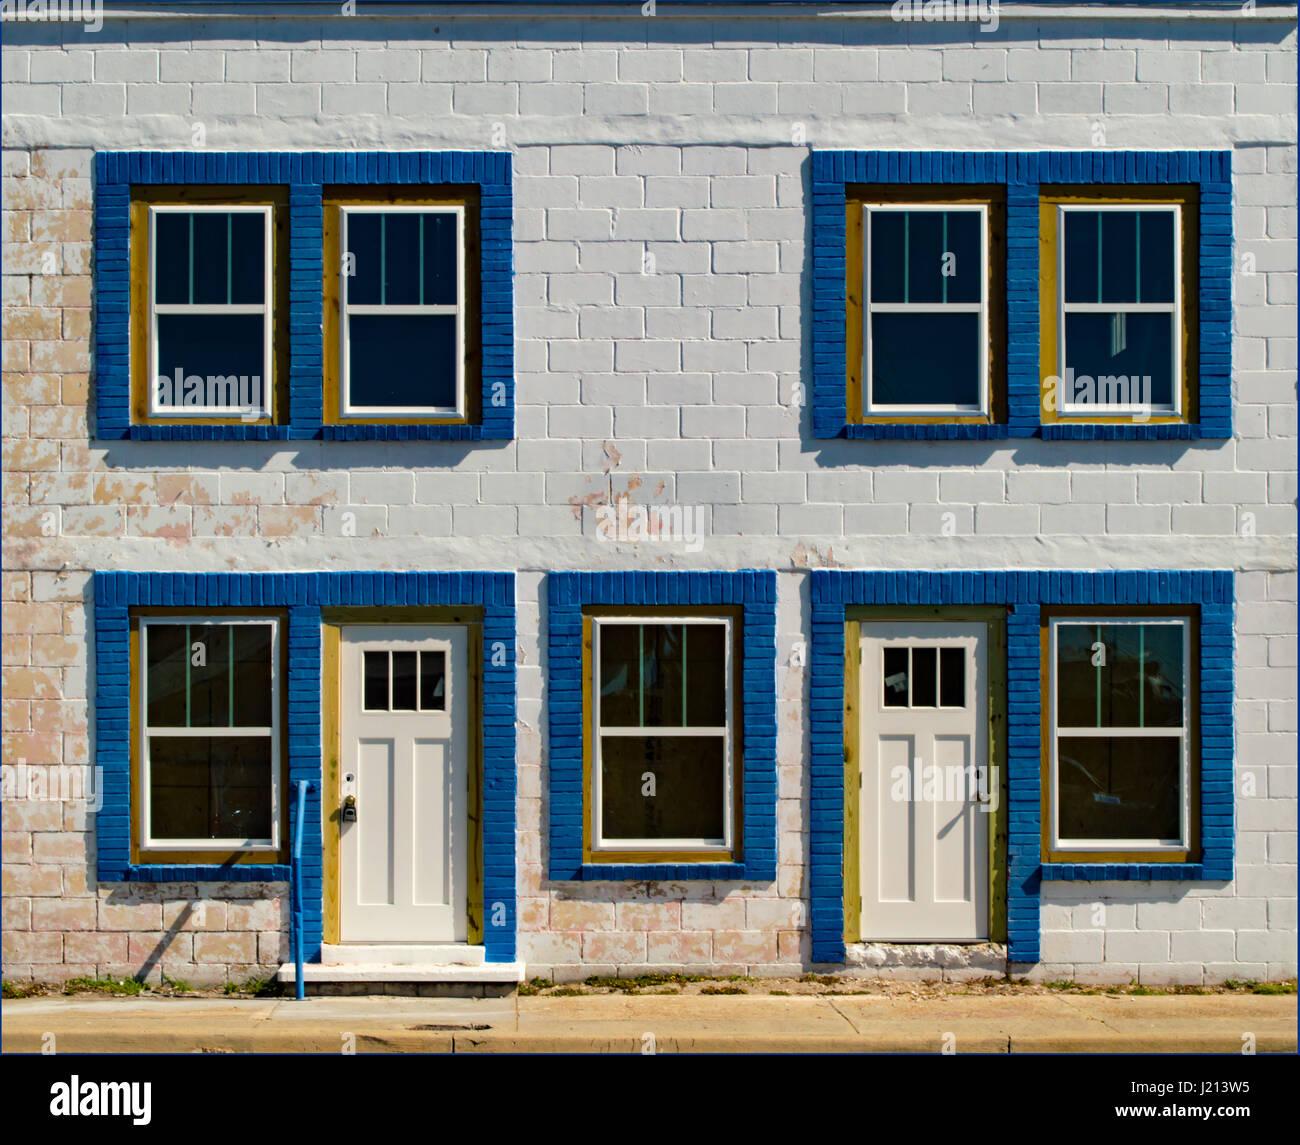 Cinder Block And Brick House   Stock Image